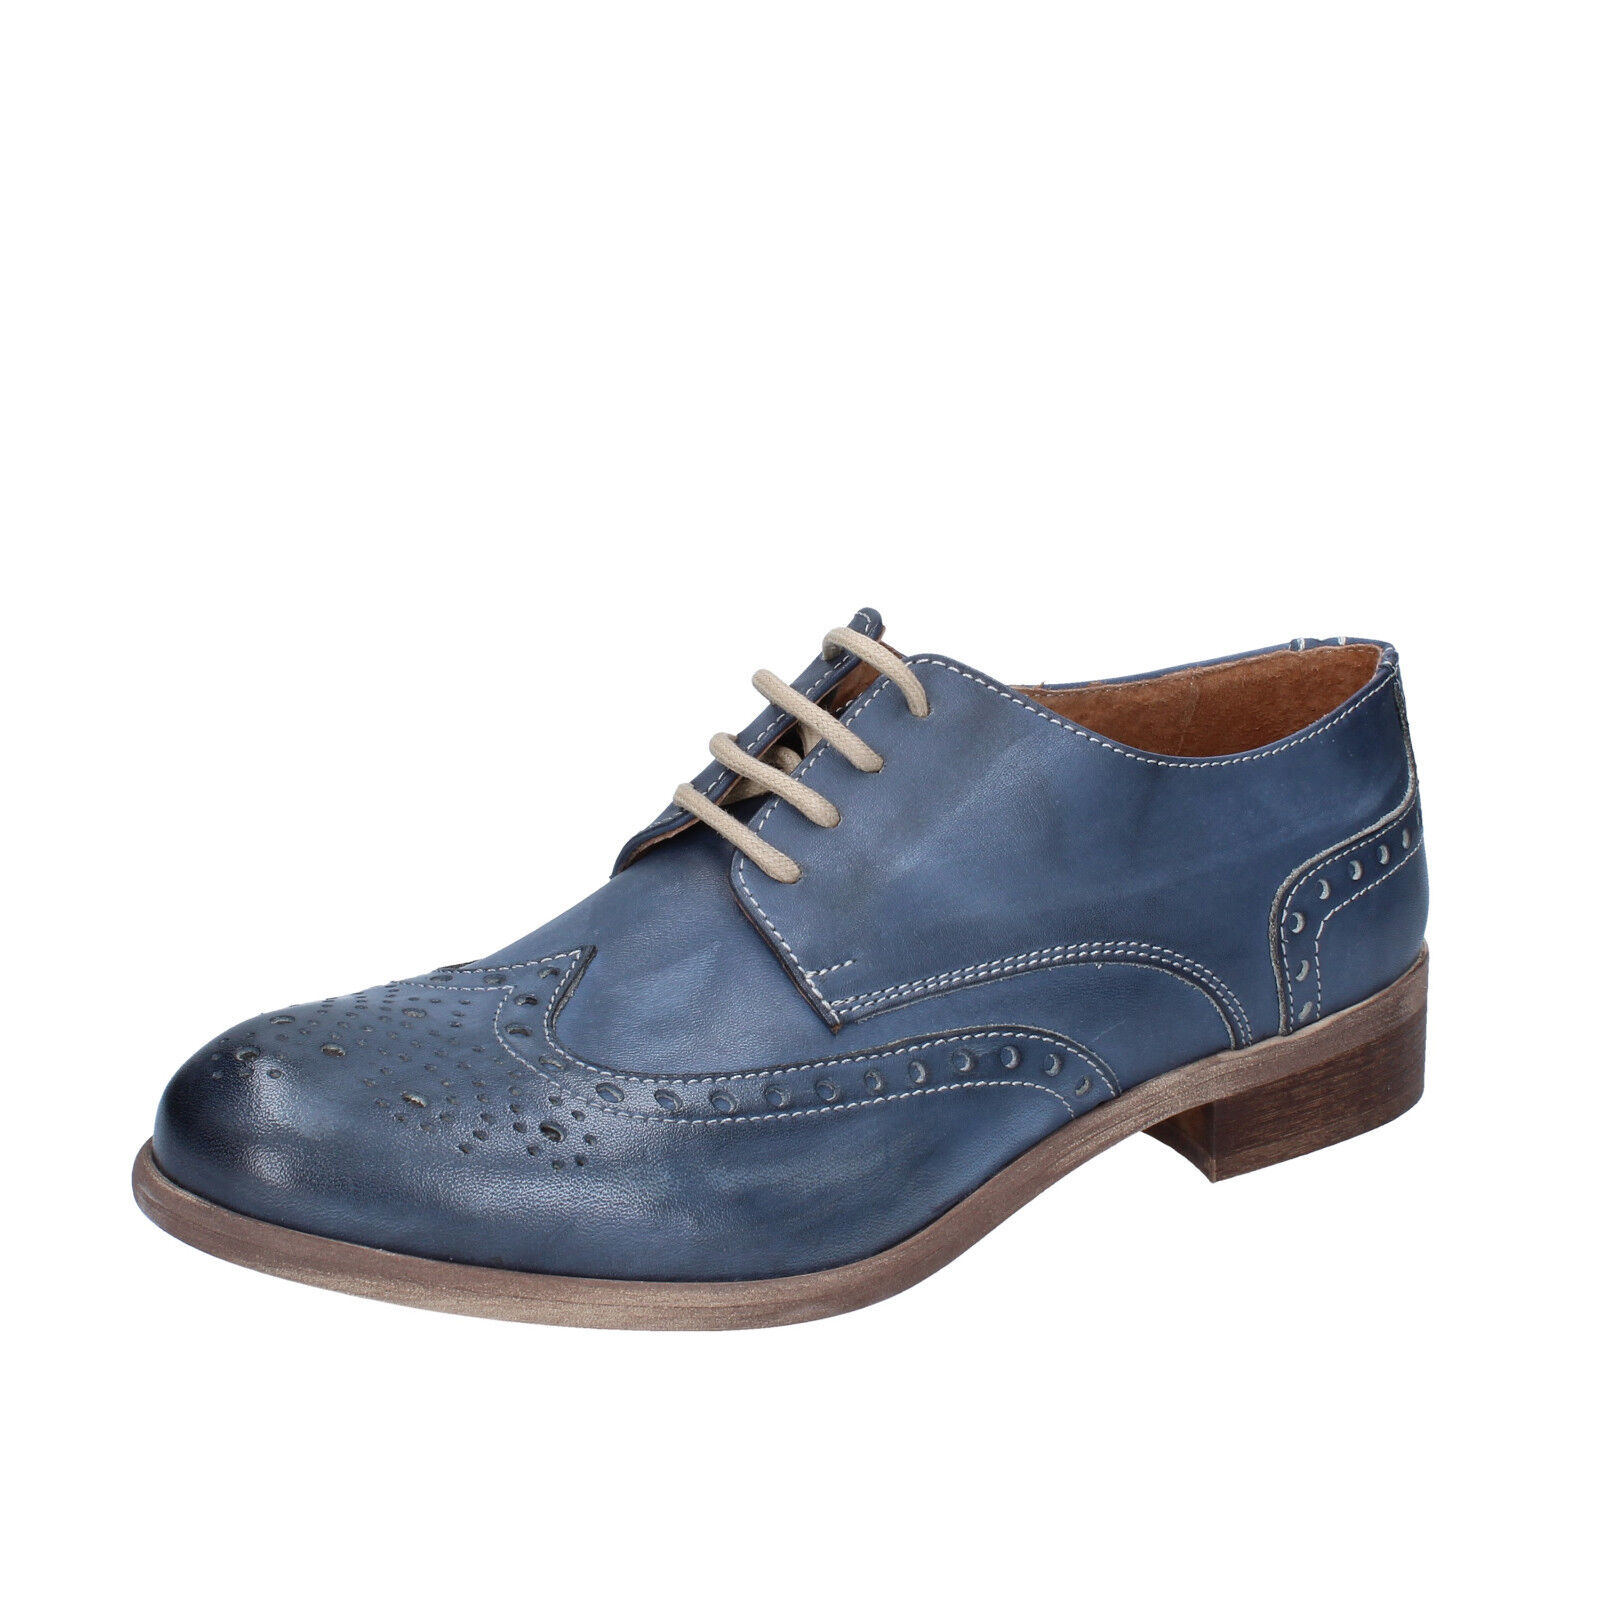 Herren schuhe KEP'S BZ887-B 40 elegante blau leder BZ887-B KEP'S a22110